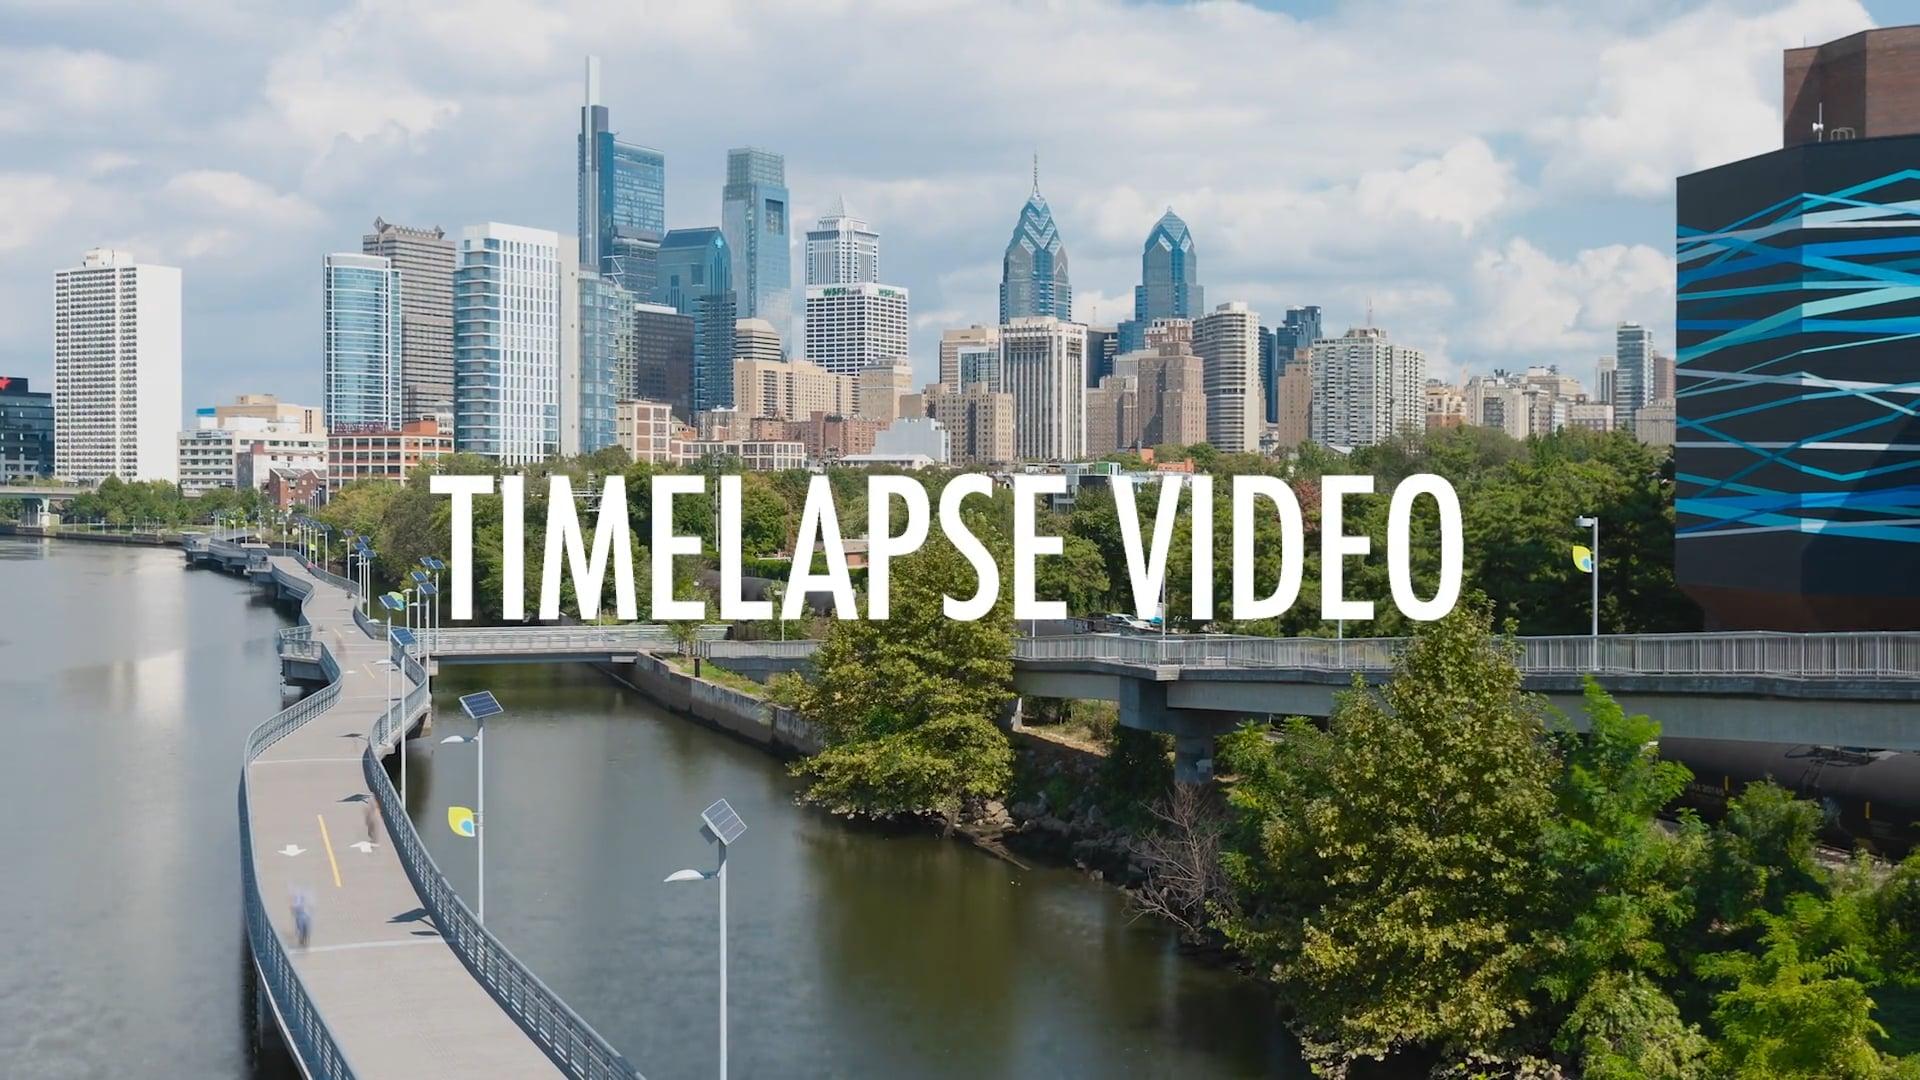 TIMELAPSE VIDEO STOCK MEDIA - PHILADELPHIA, PA